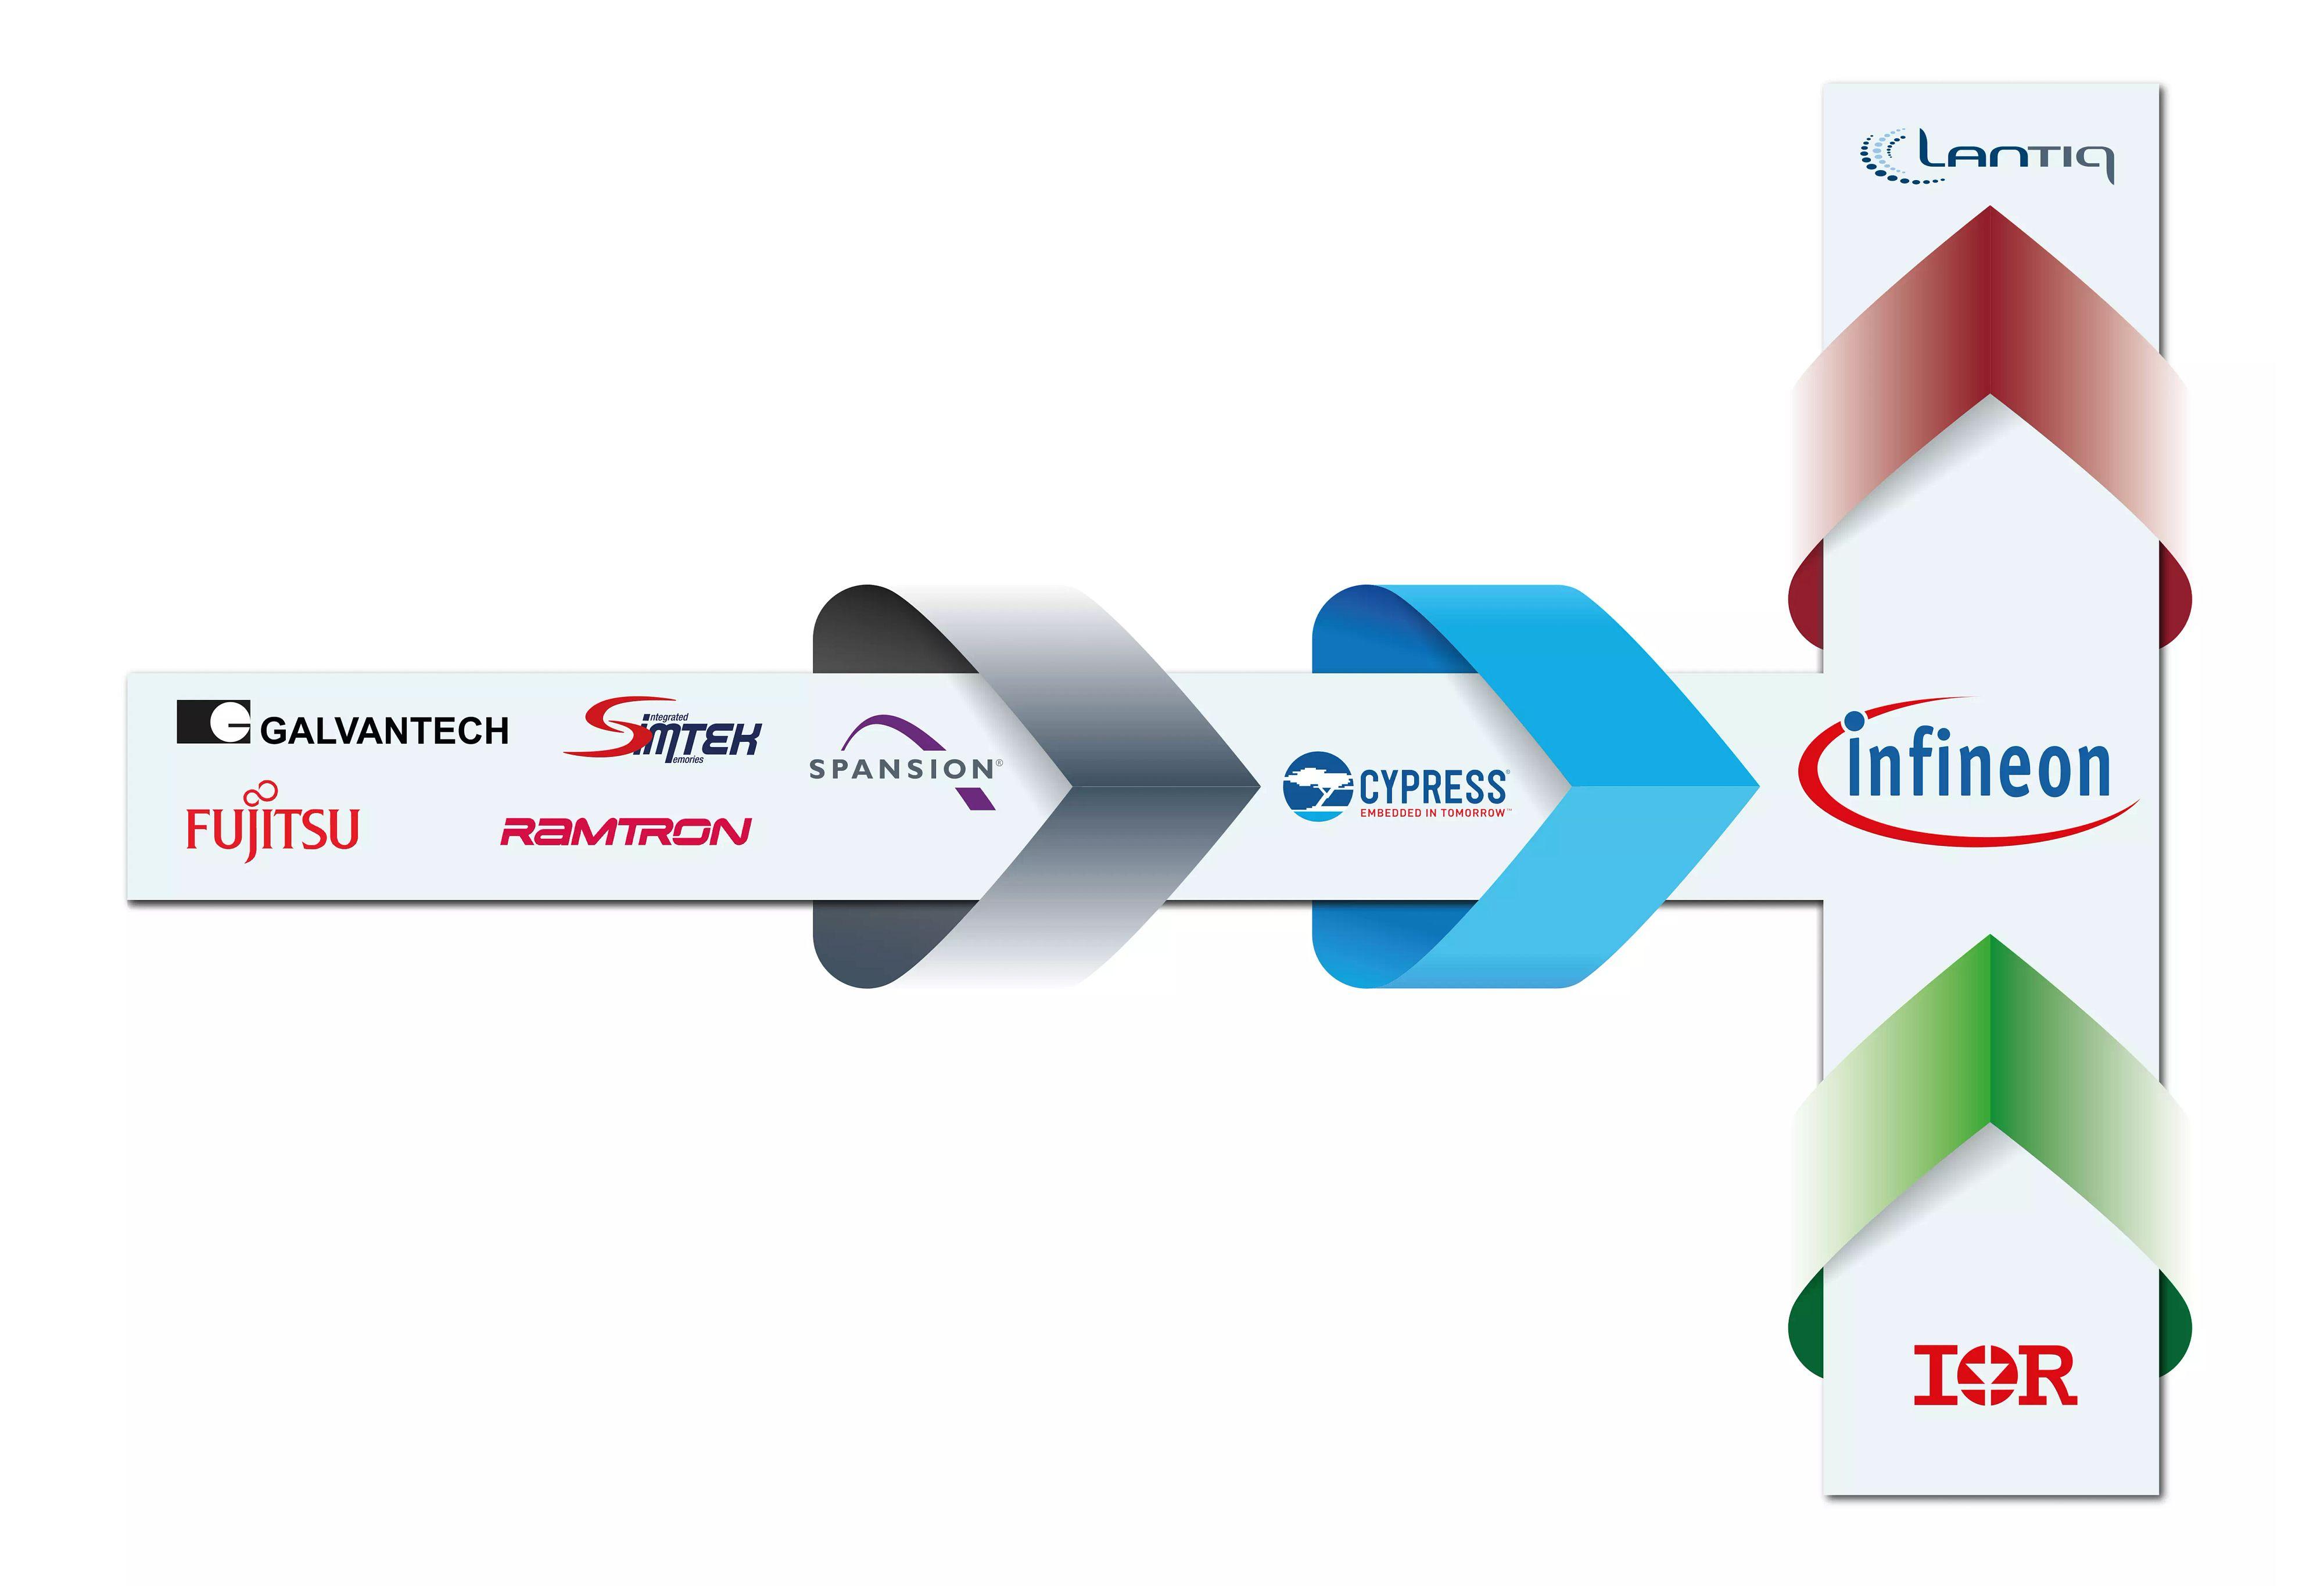 Infineon History